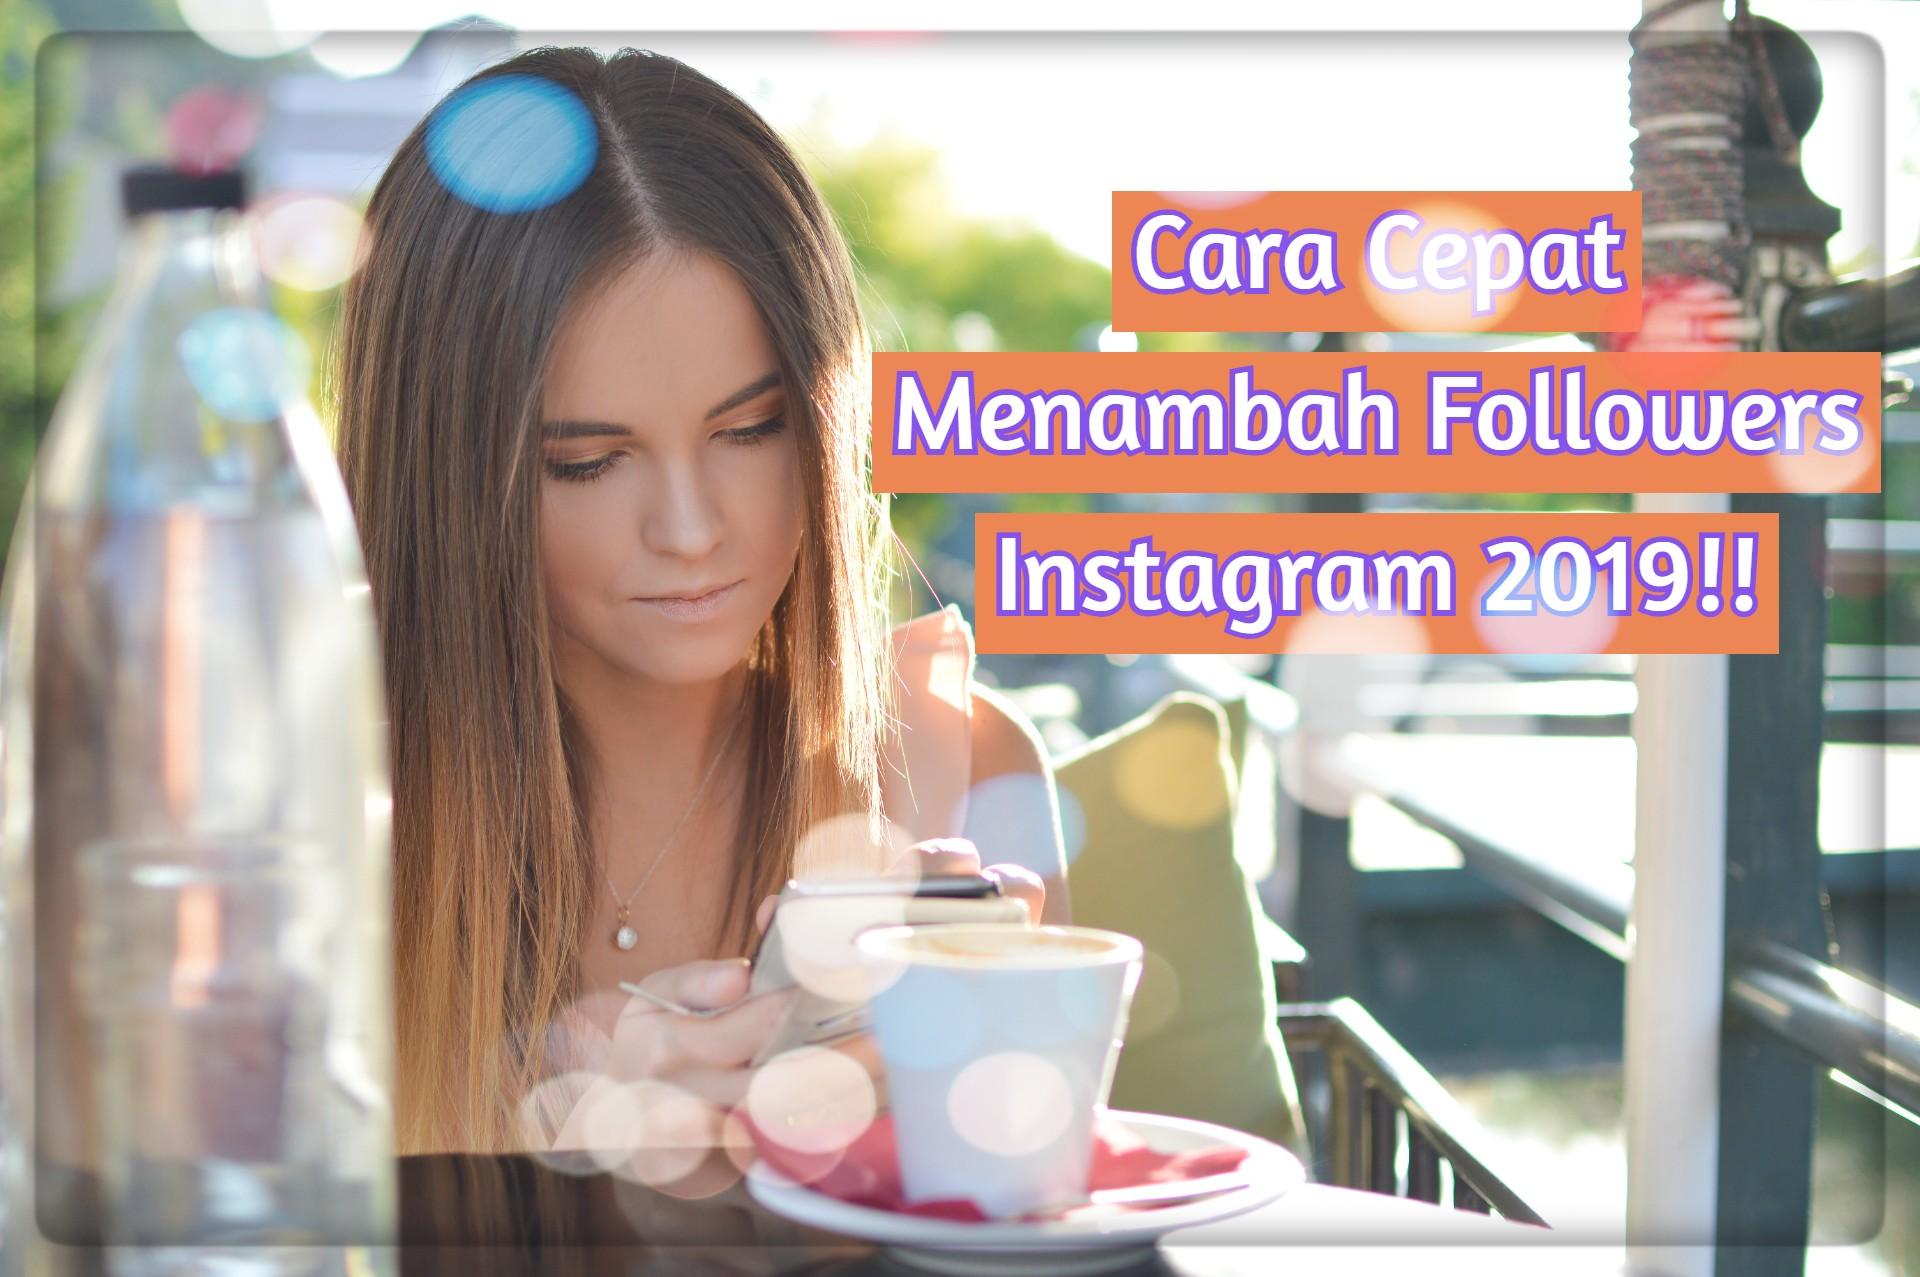 Cara Cepat Menambah Followers Instagram 2019!!